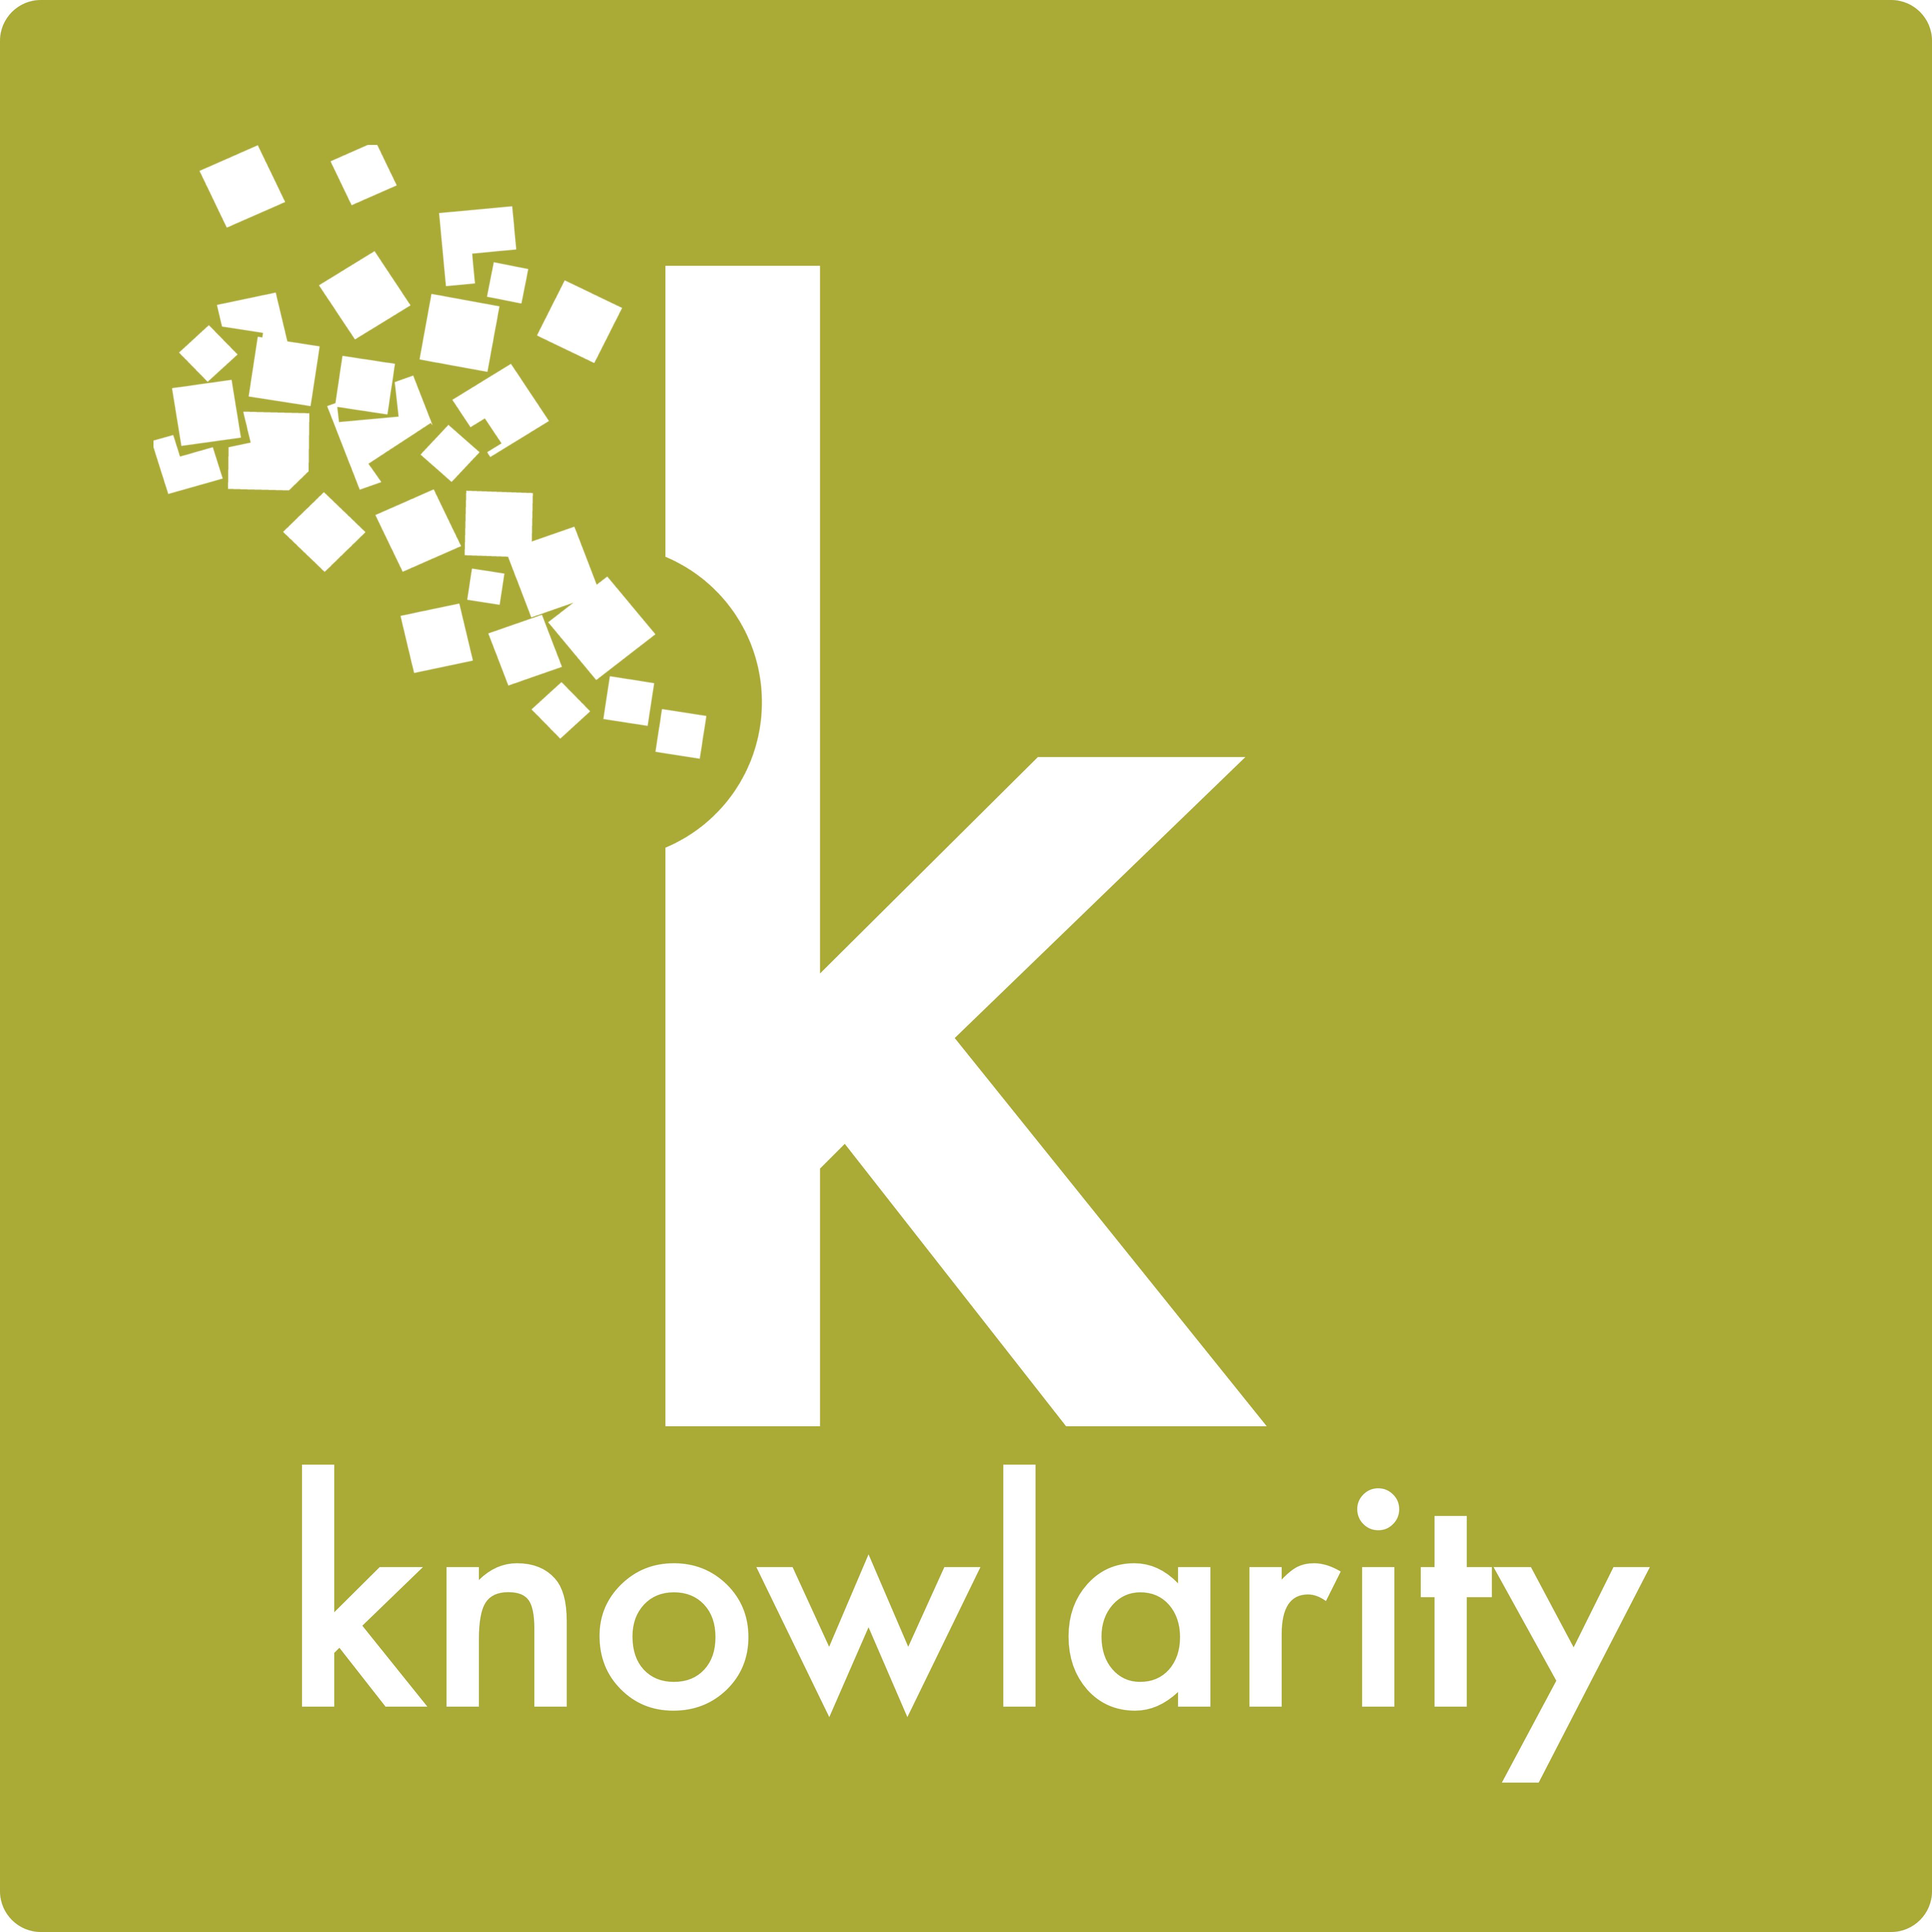 File:Knowlarity - Short Form Logo - Ver 4 - 21OCT16NM.jpg ...